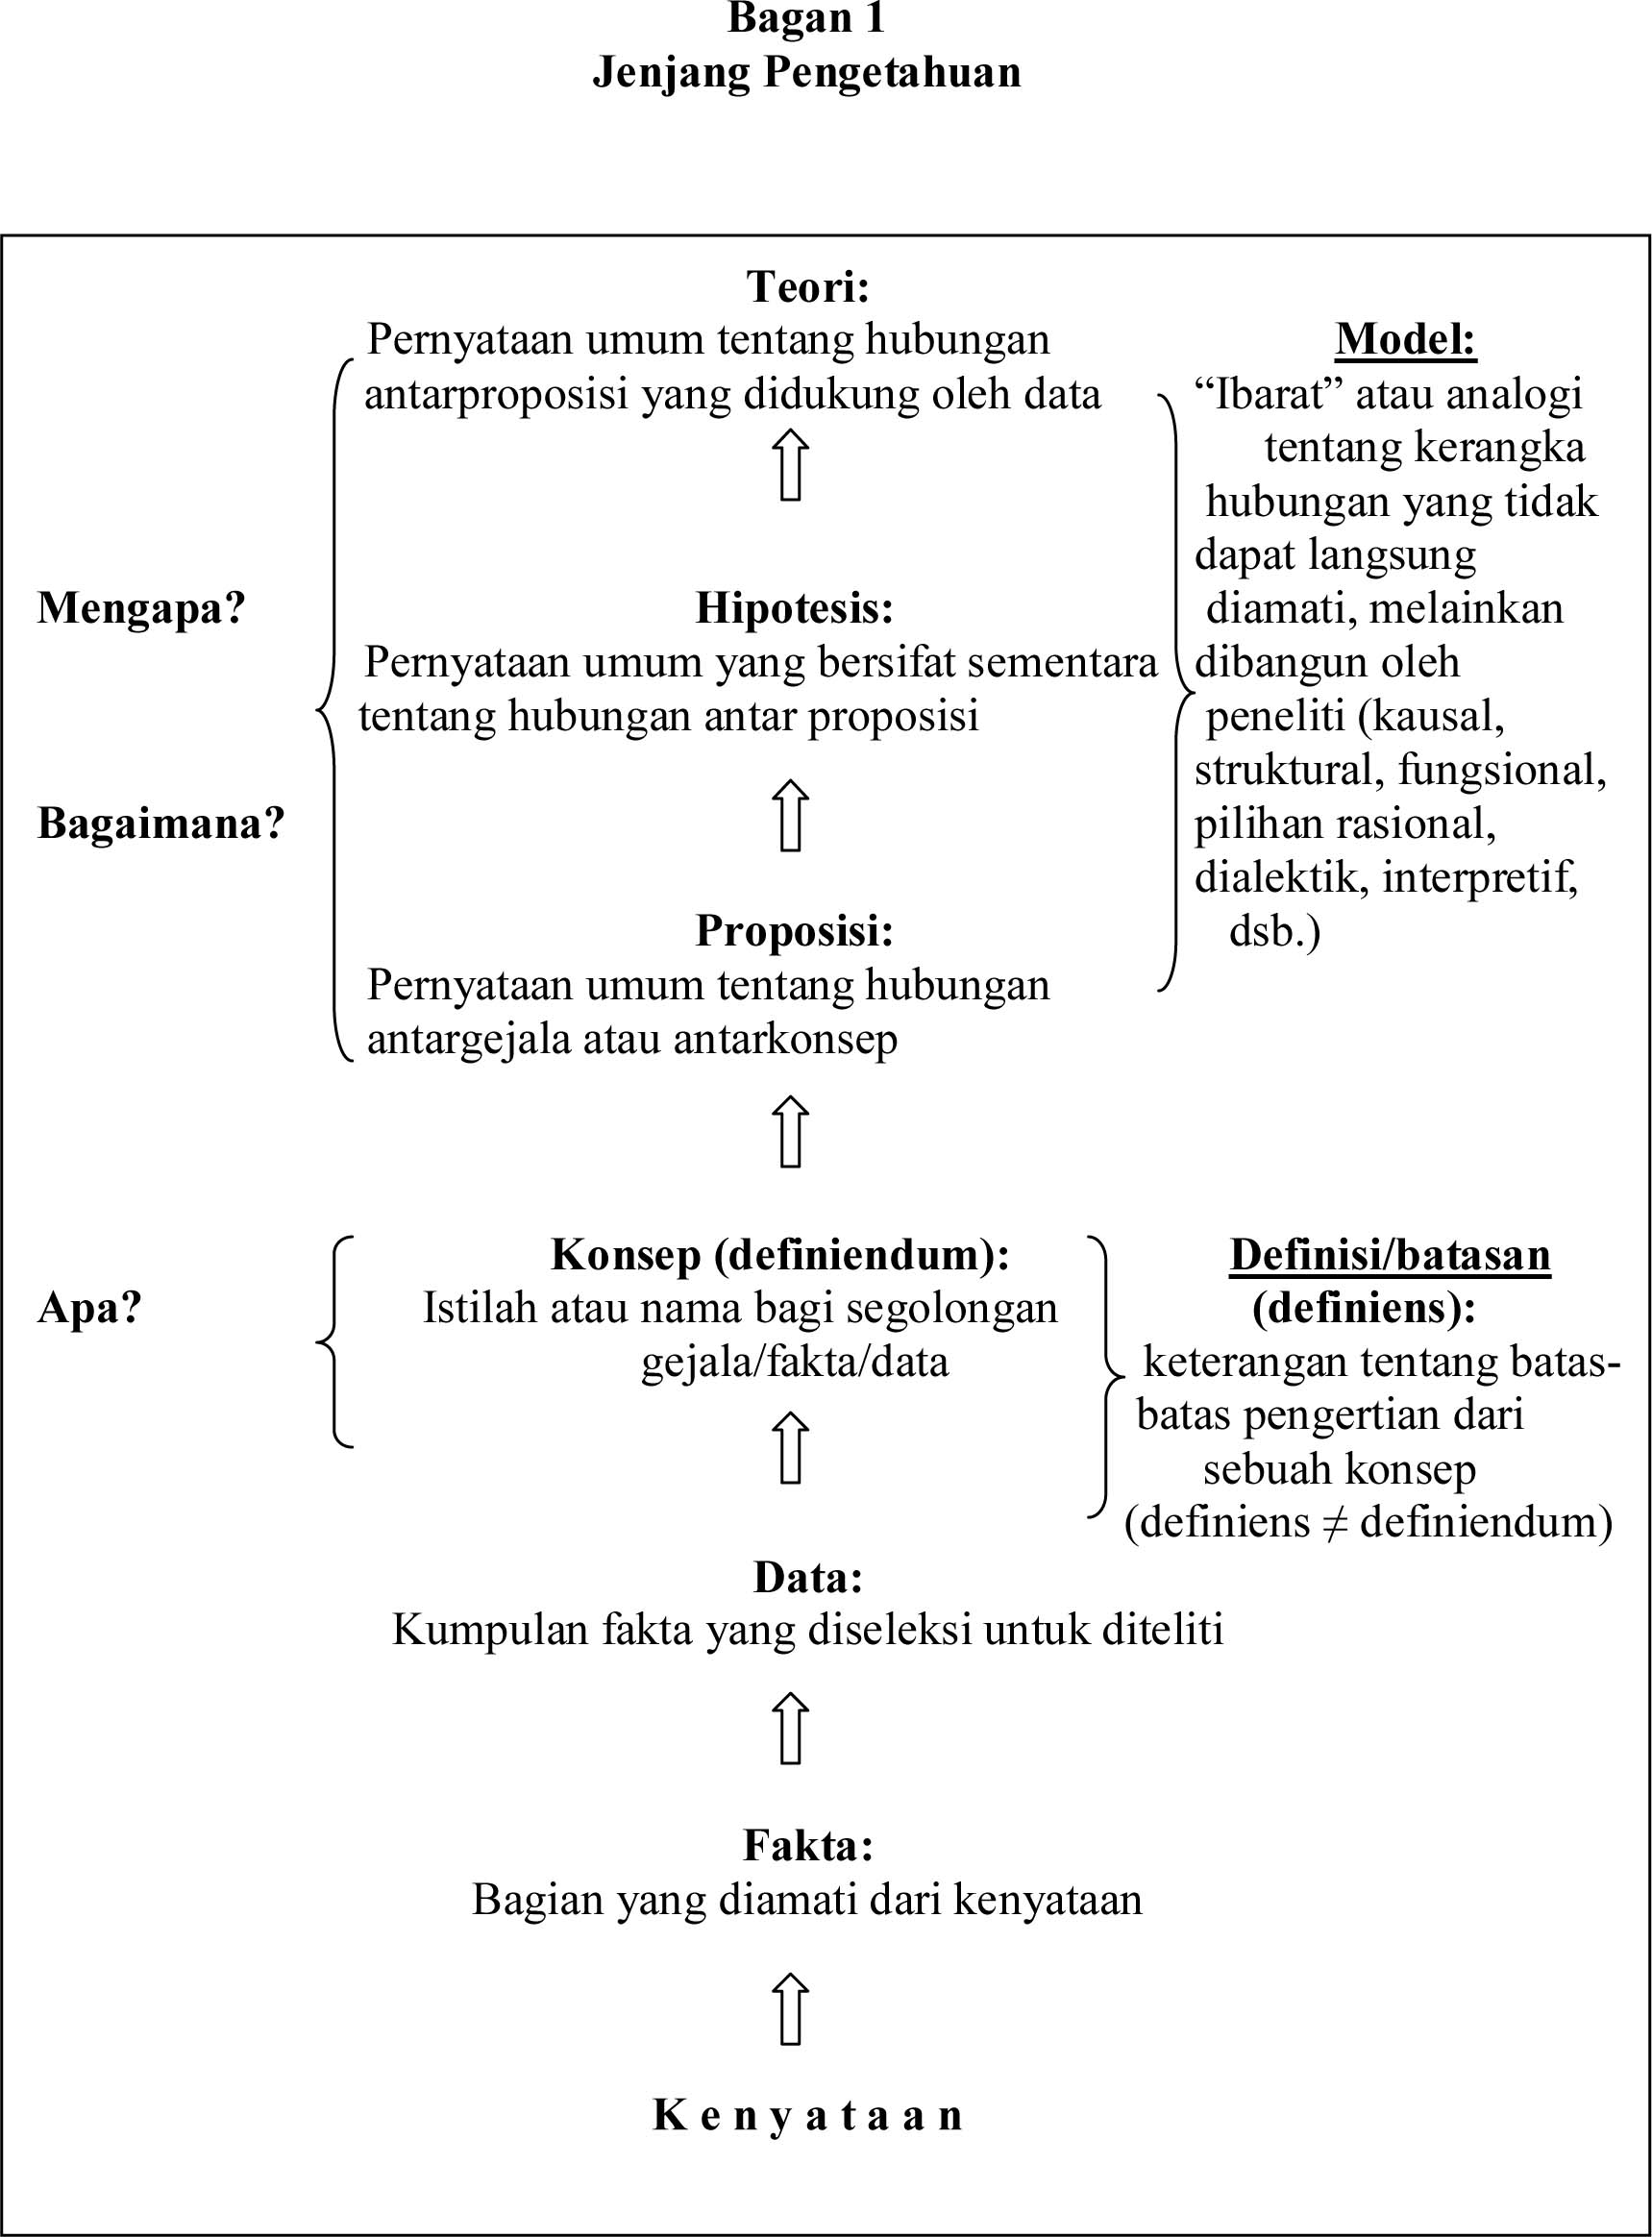 Metode kualitatif dalam ilmu ilmu sosial balai pelestarian nilai sr mps kualitatif 1 jenjang pengetahuan ccuart Gallery